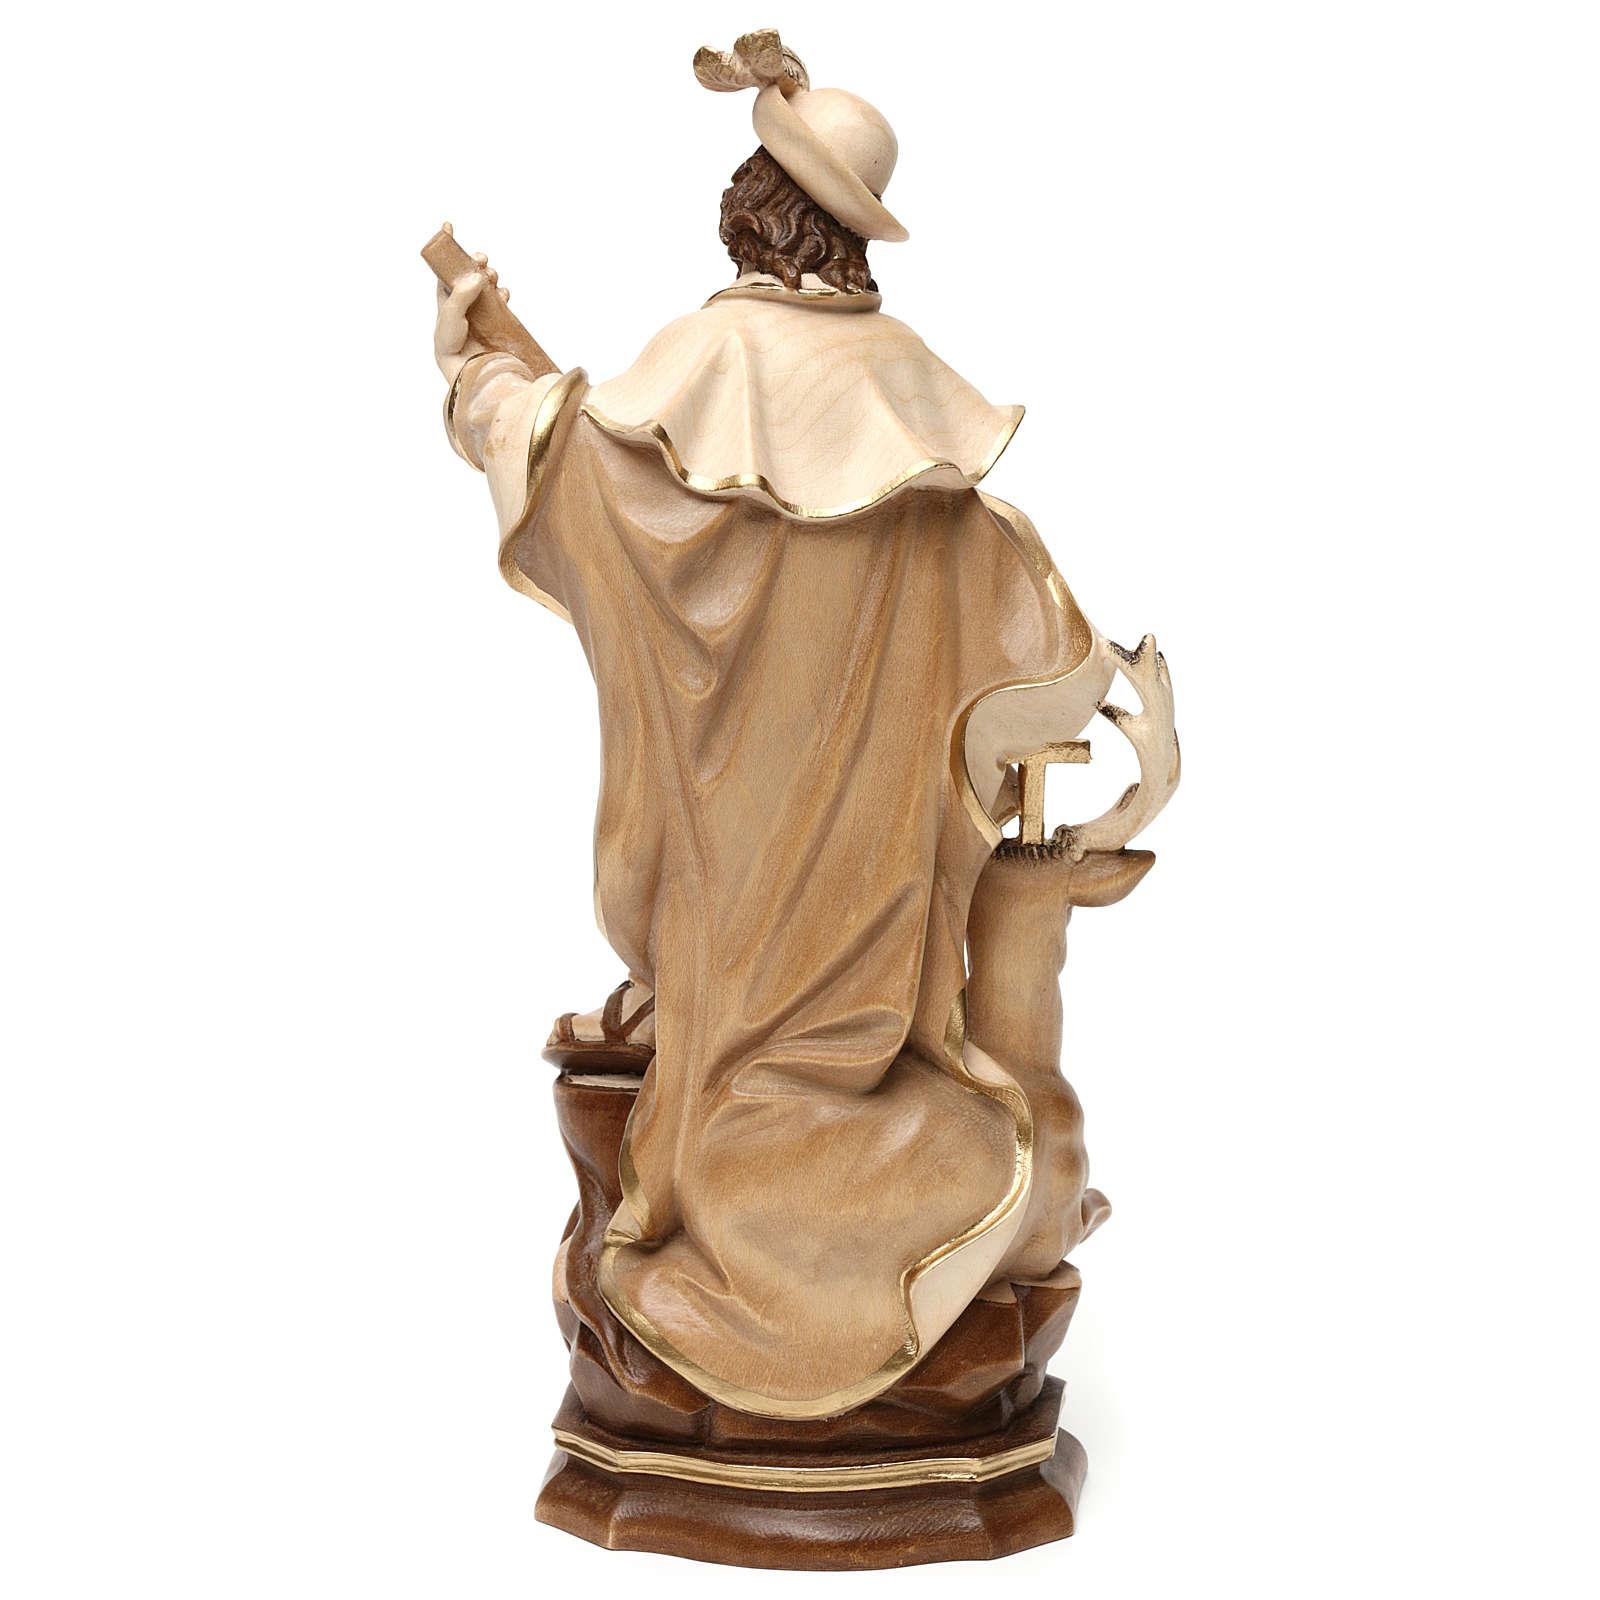 Santo Umberto madeira brunida 3 cores Val Gardena 4